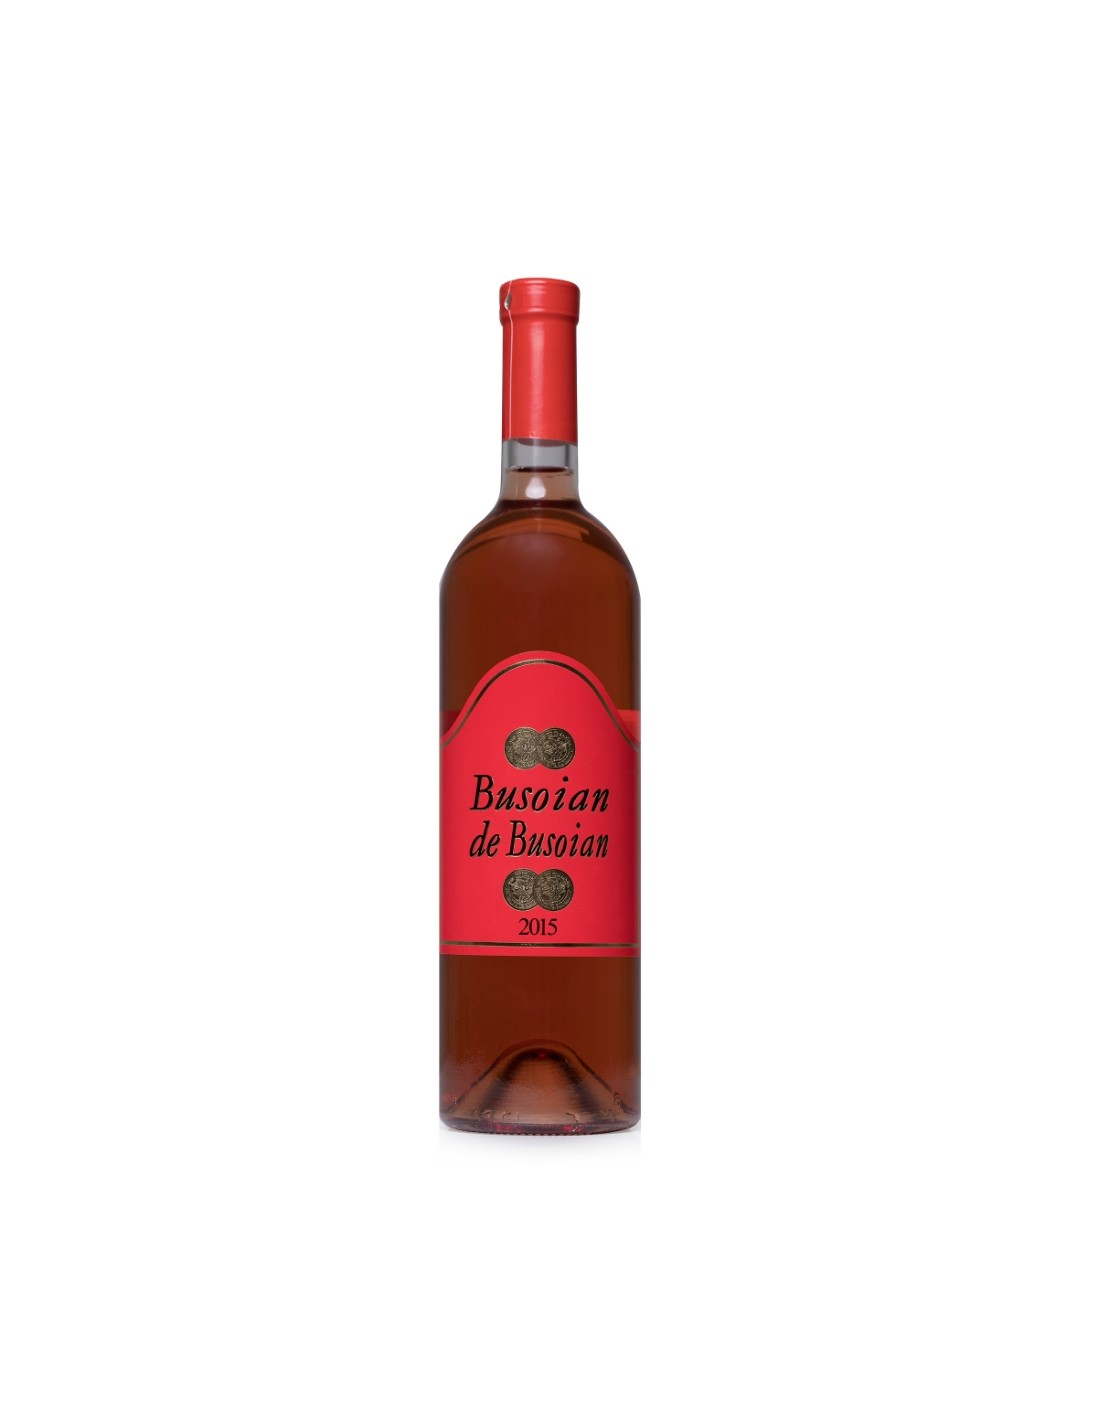 Vin roze demidulce, Muscat, Busoian de Busoian Hulboaca, 0.75L, 12.5% alc., Republica Moldova